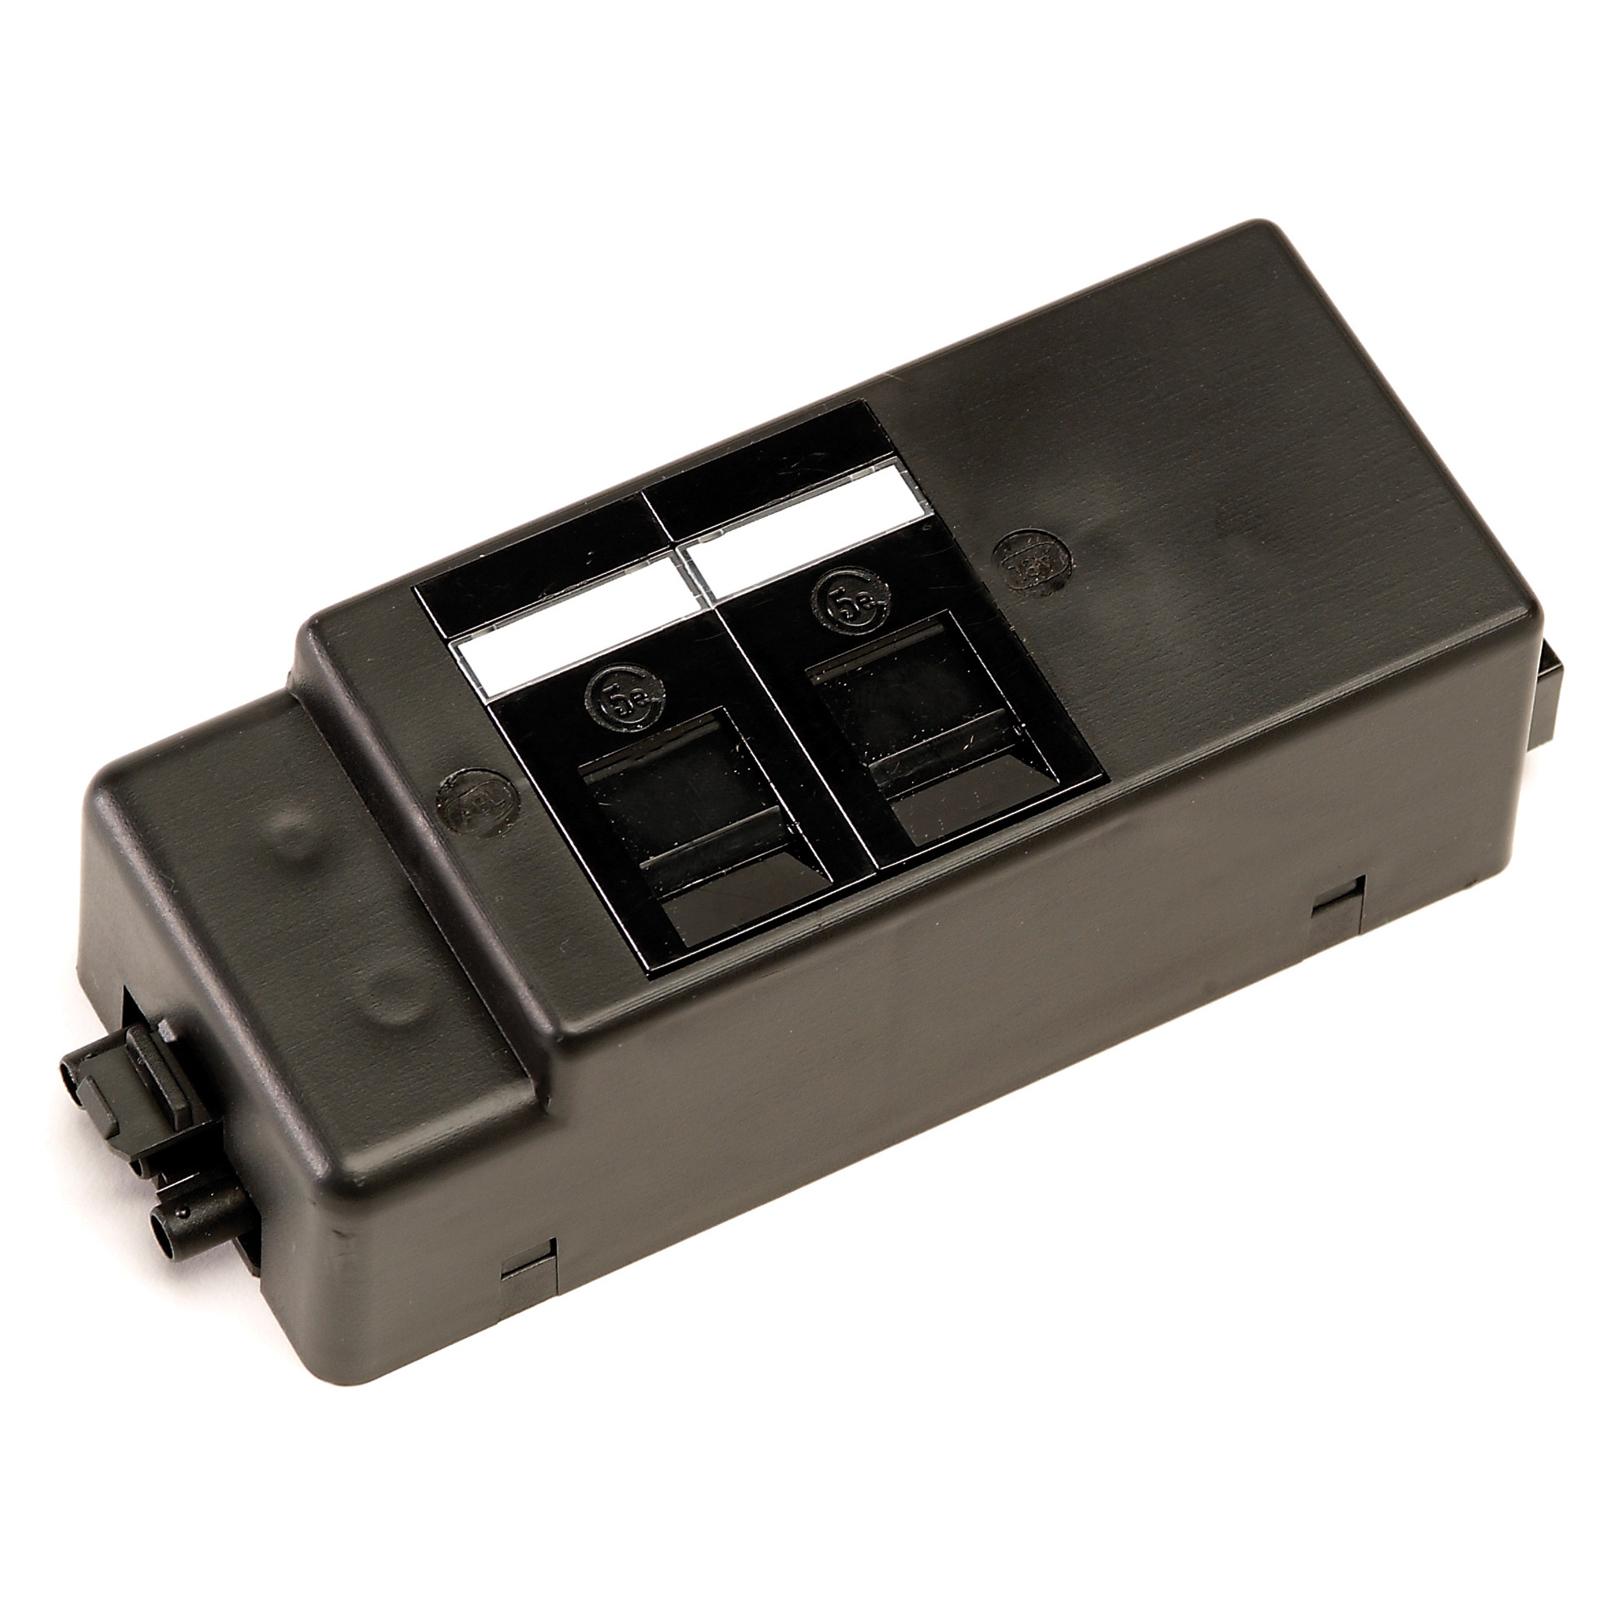 Plug Socket Under desk power bar 2 x RJ45 sockets - black